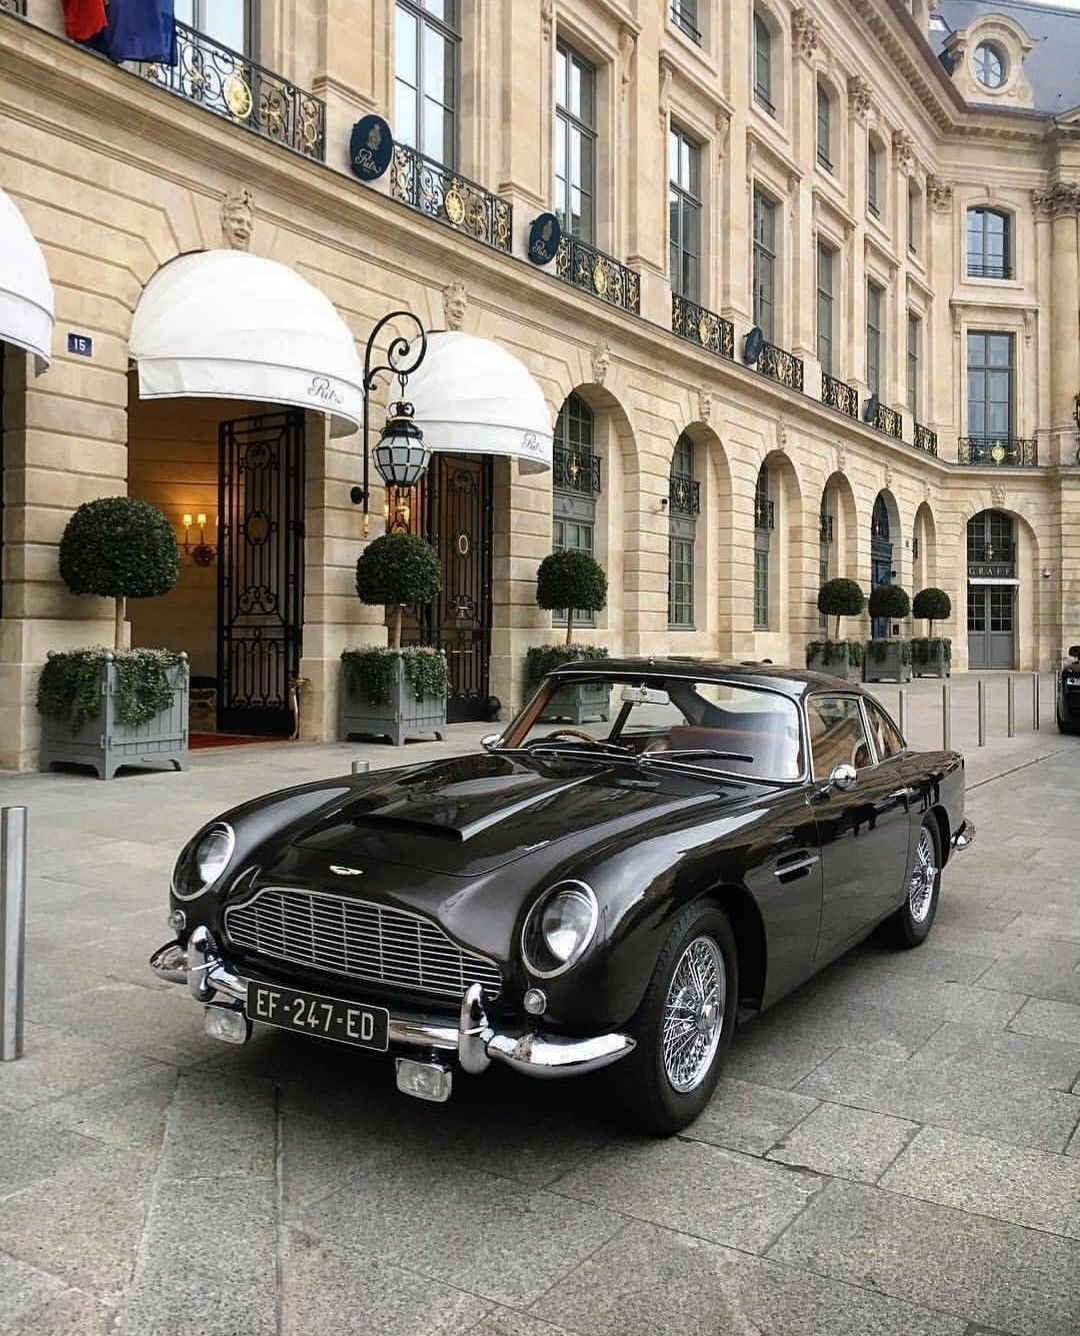 pin by jes emkay on automobiles aston martin cars classic cars rh pinterest com